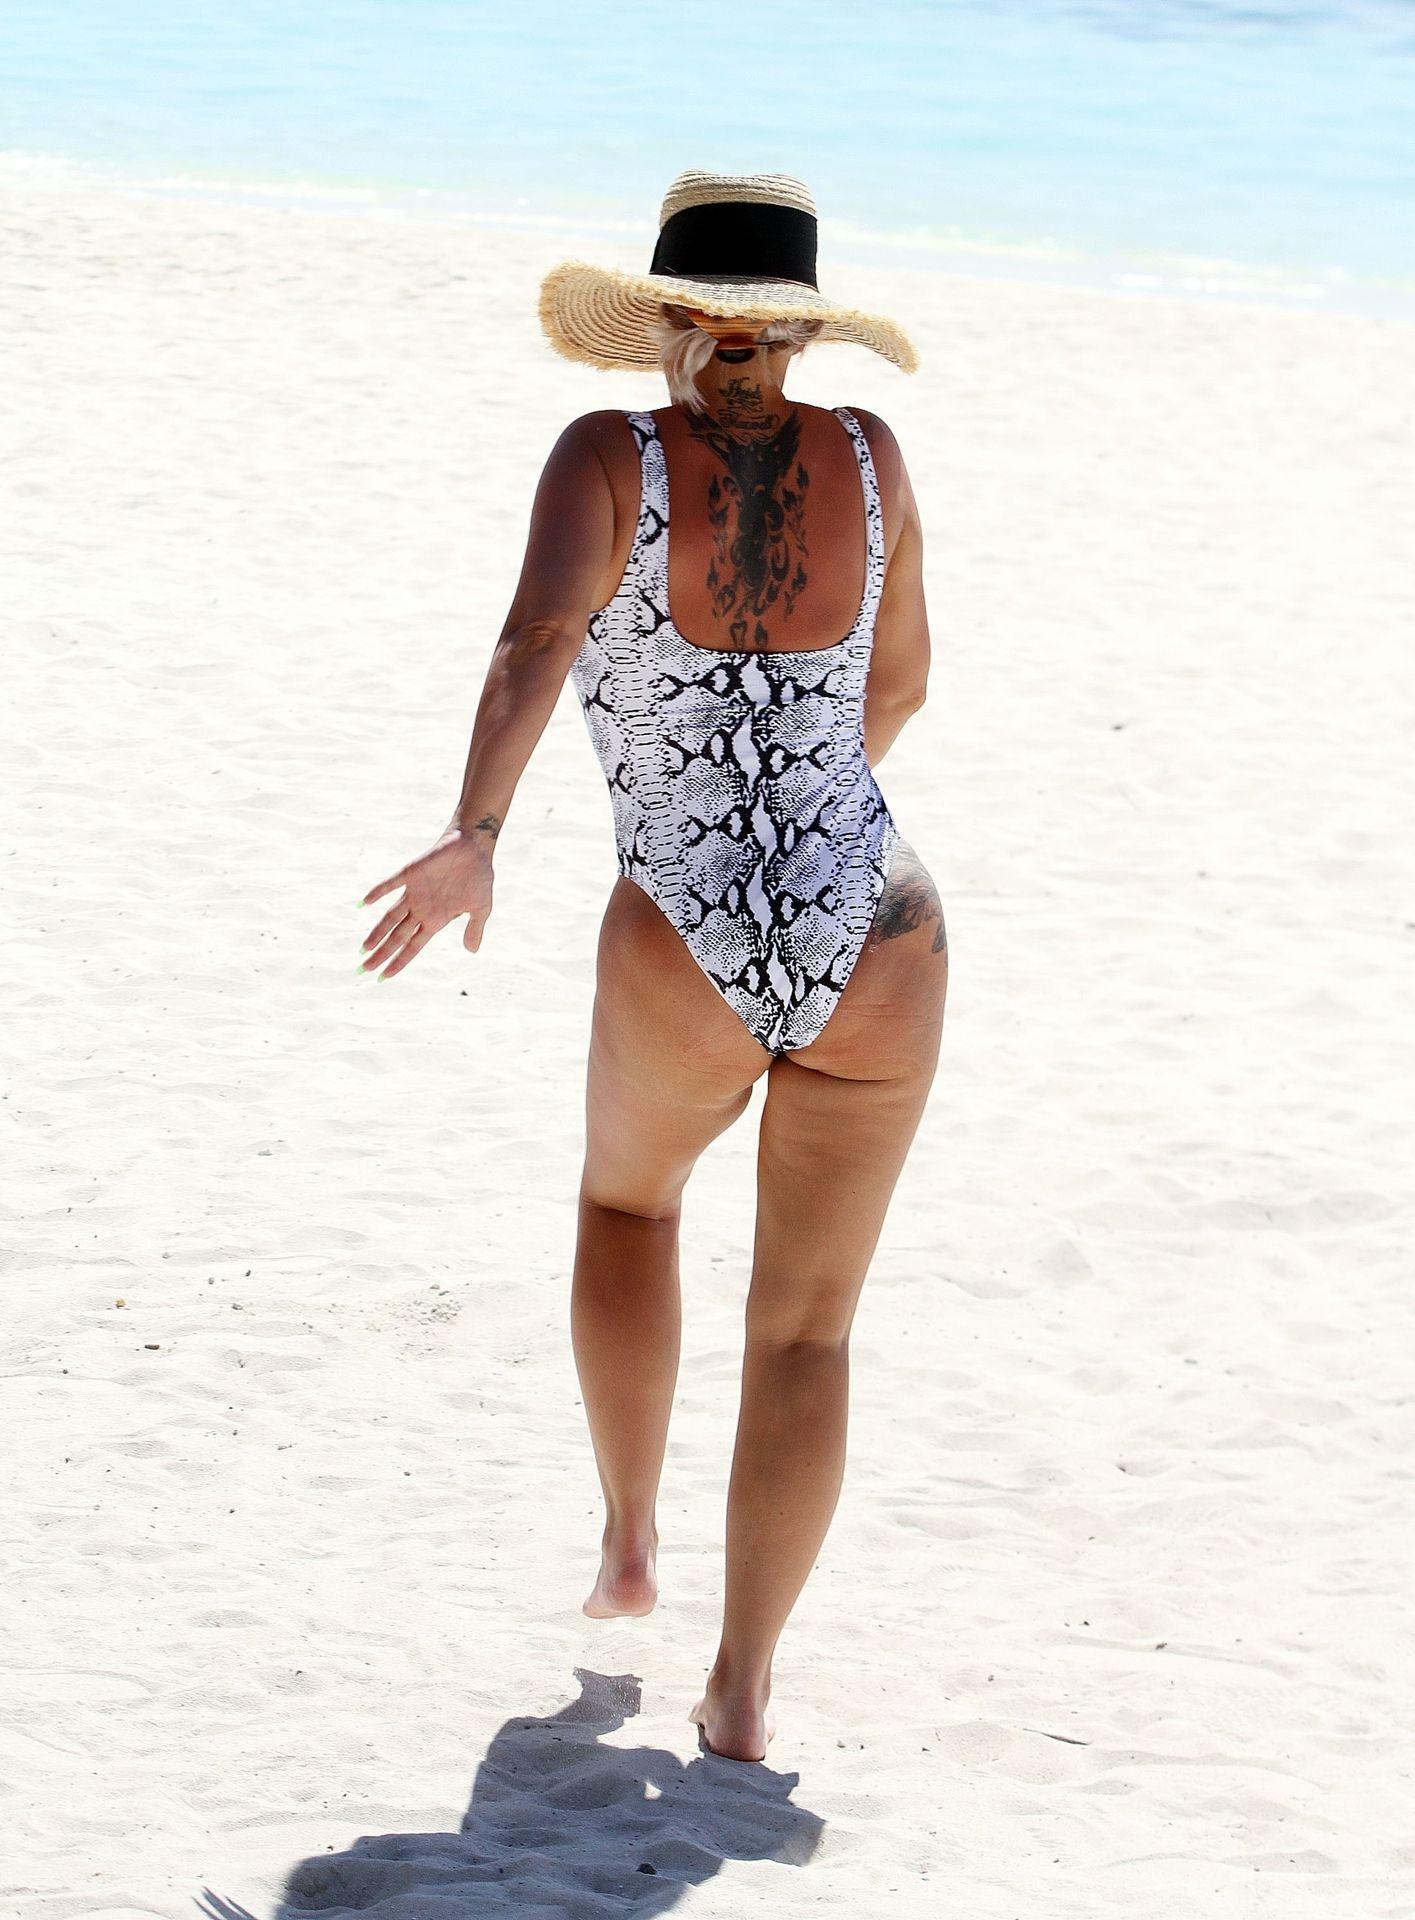 Kerry Katona & Ryan Mahoney Hit The Beach On Holiday At Their Luxury 5 Star Resort Ayada Maldives 0034